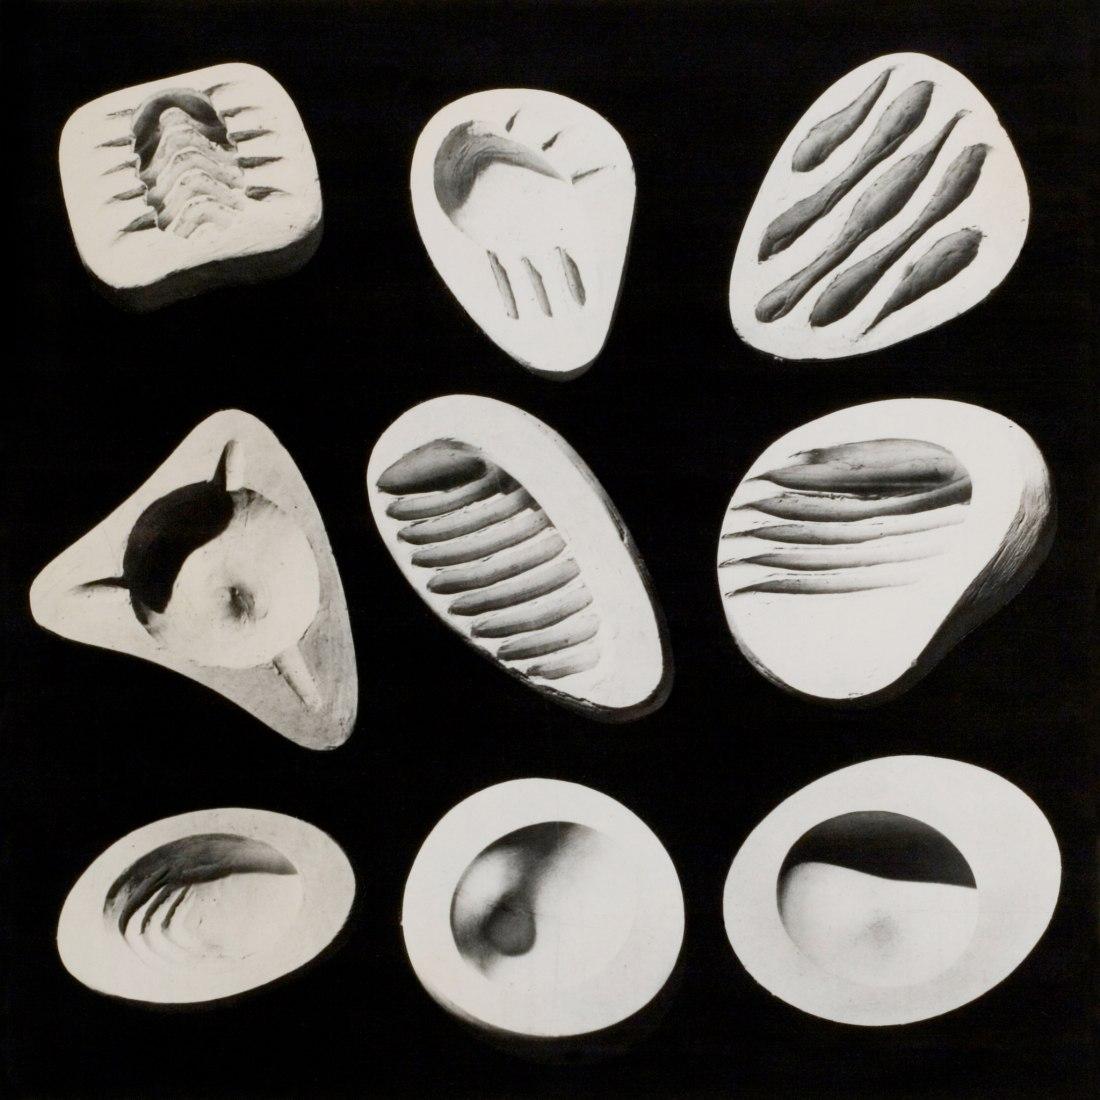 Isamu Noguchi, Ashtray Prototypes, c. 1945–48. Plaster. The Noguchi Museum Archives. ©INFGM / ARS. Image courtesy of Noguchi Museum